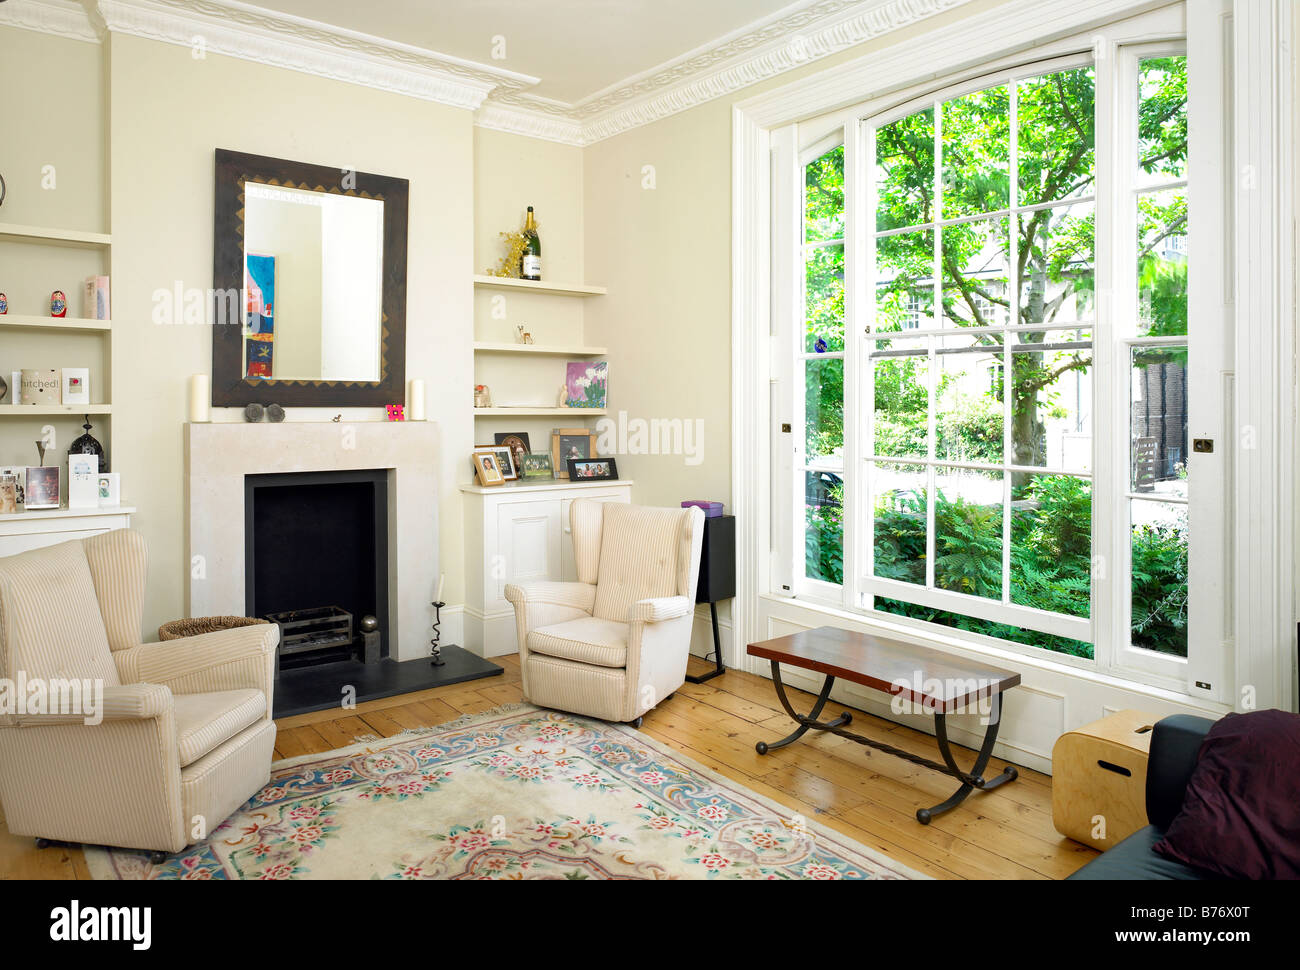 Basement Living Room In Georgian Townhouse North London